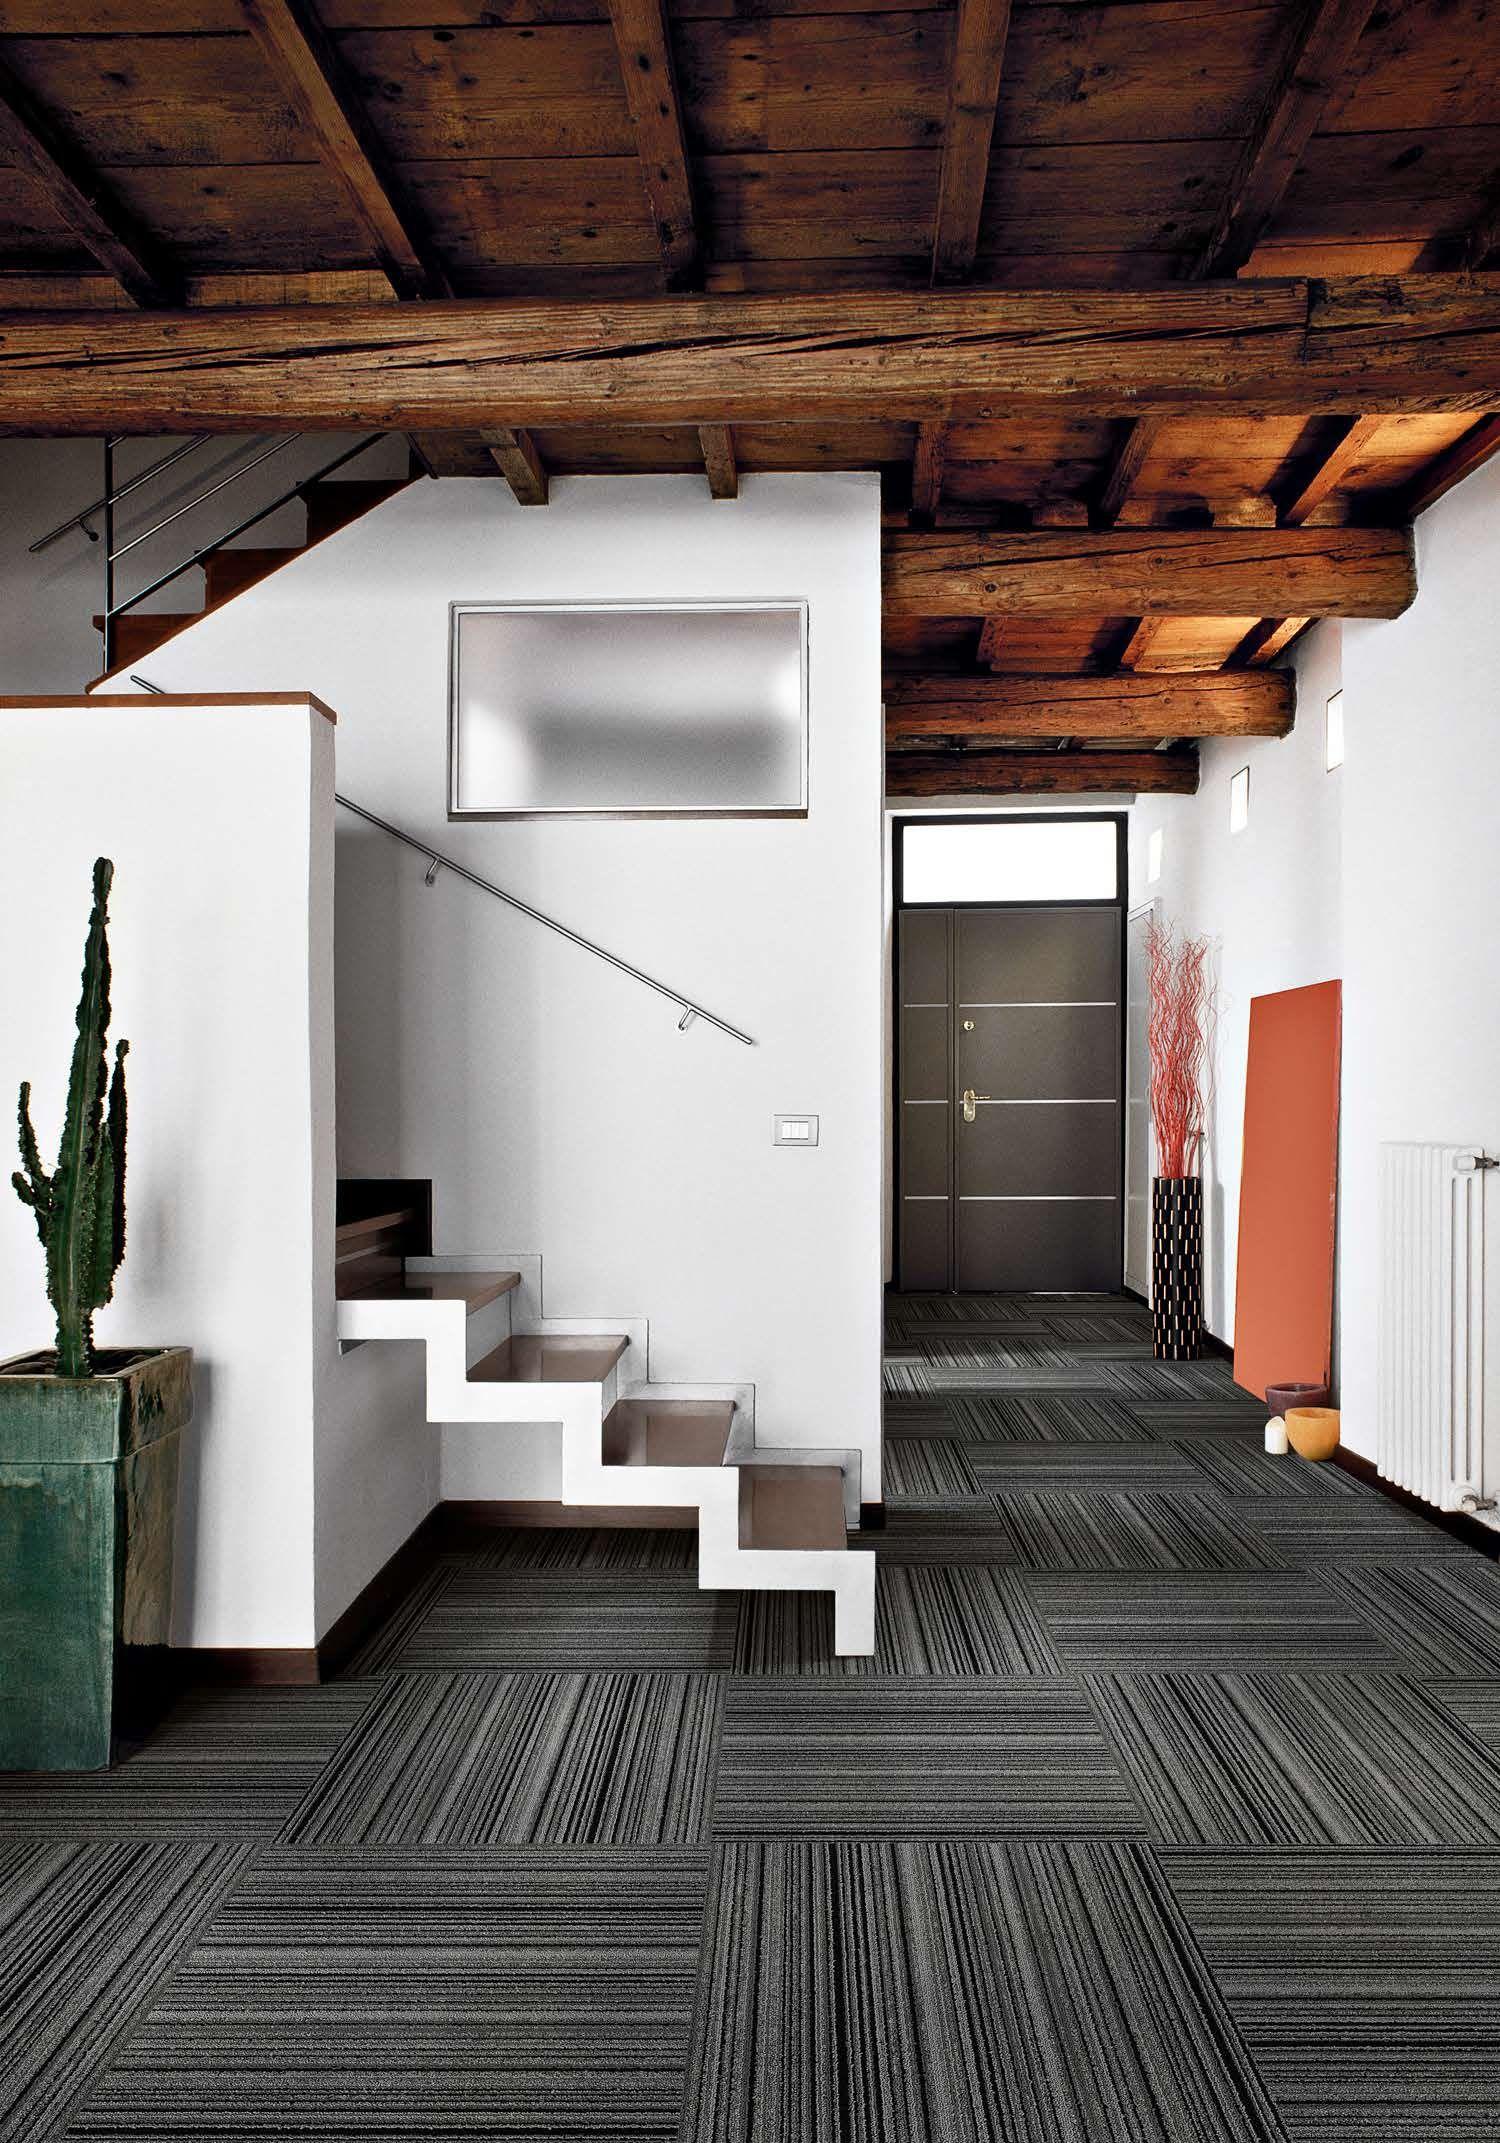 "PARALLELS Carpet Tiles 23.5"" x 23.5"" in 2020 Modern"